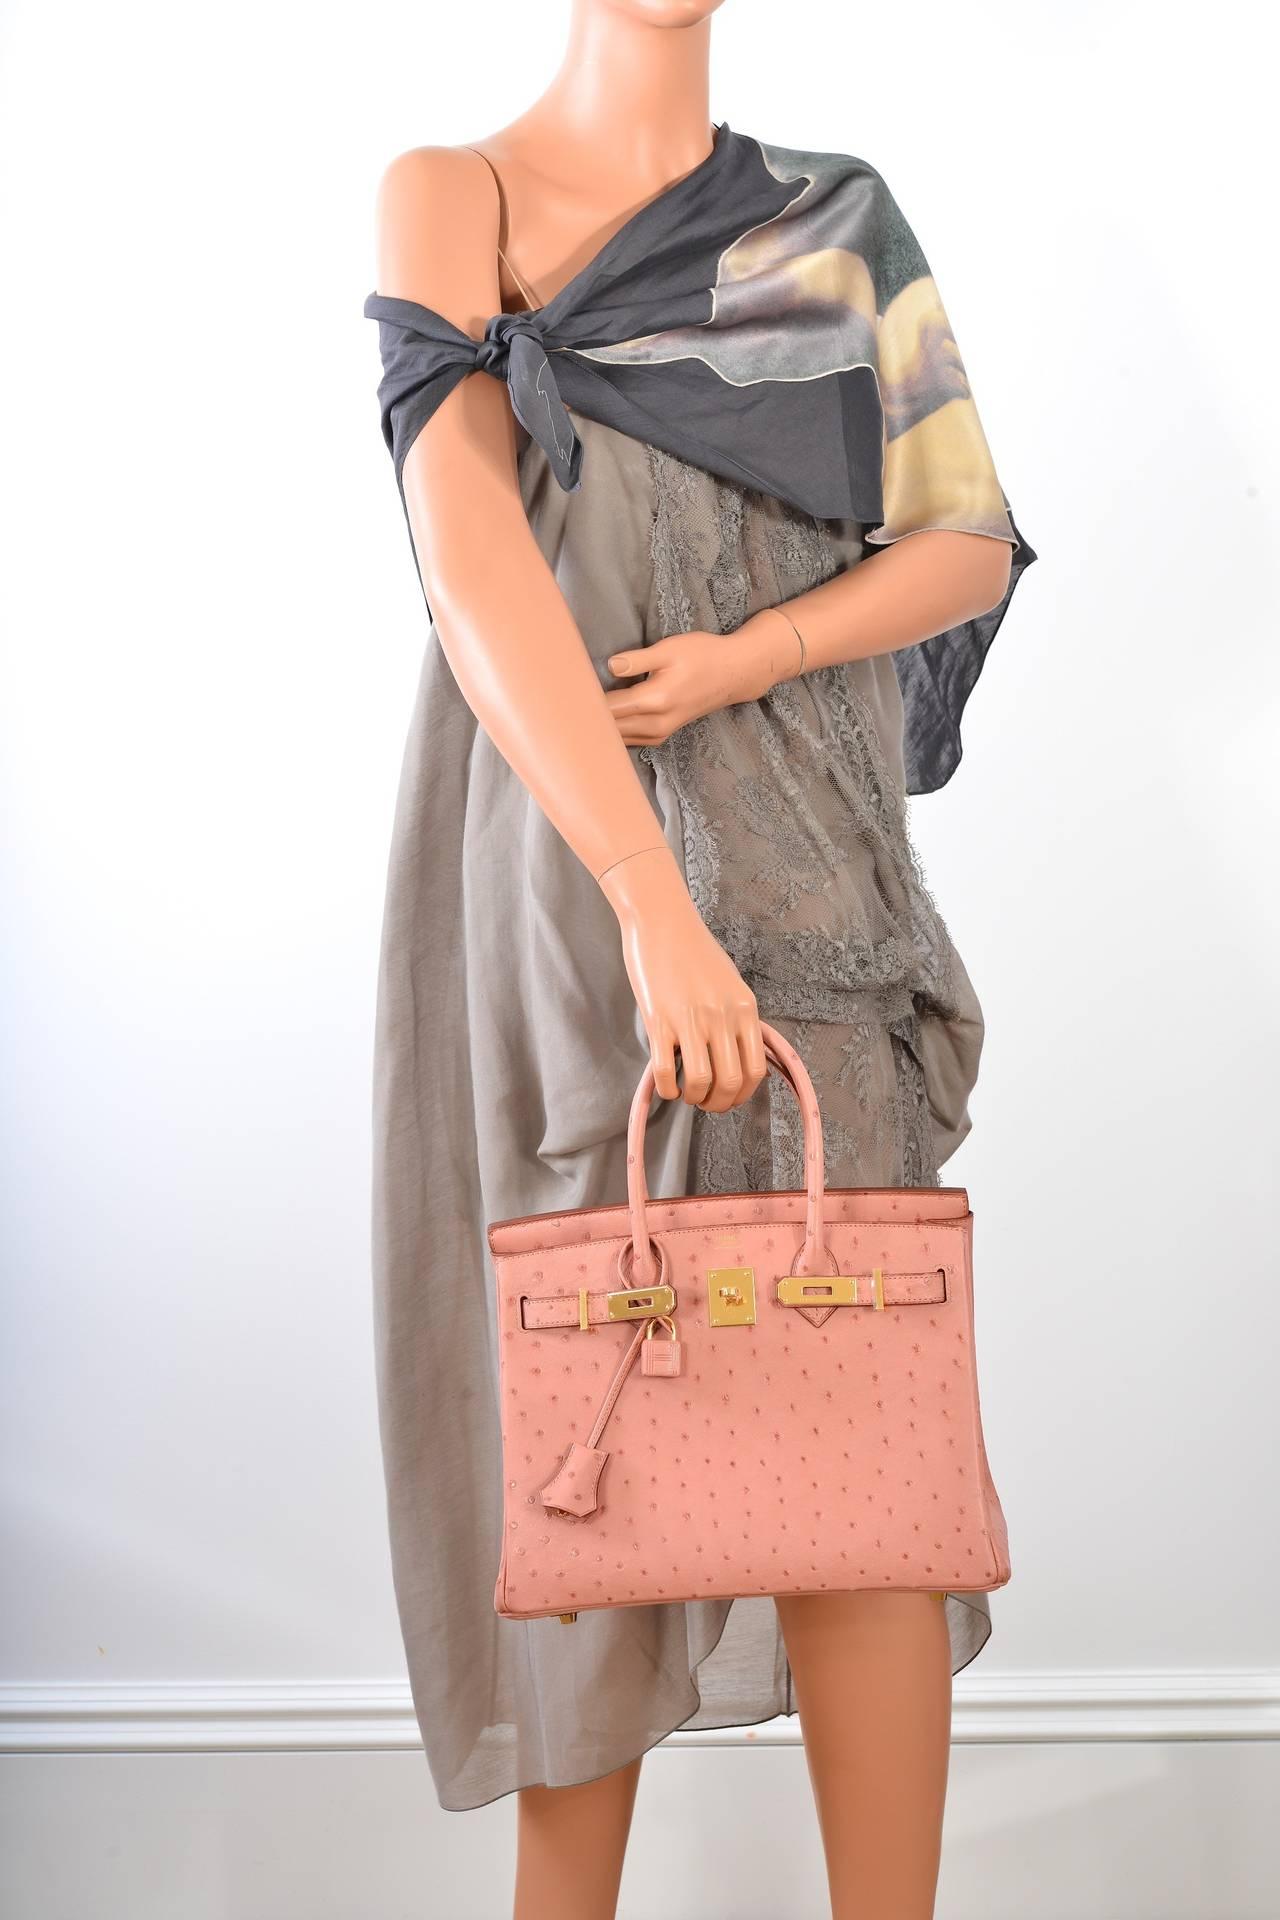 hermes birkin purse - HERMES BIRKIN BAG 30cm OSTRICH TERRE CUITIE PINK GOLD HARDWARE ...